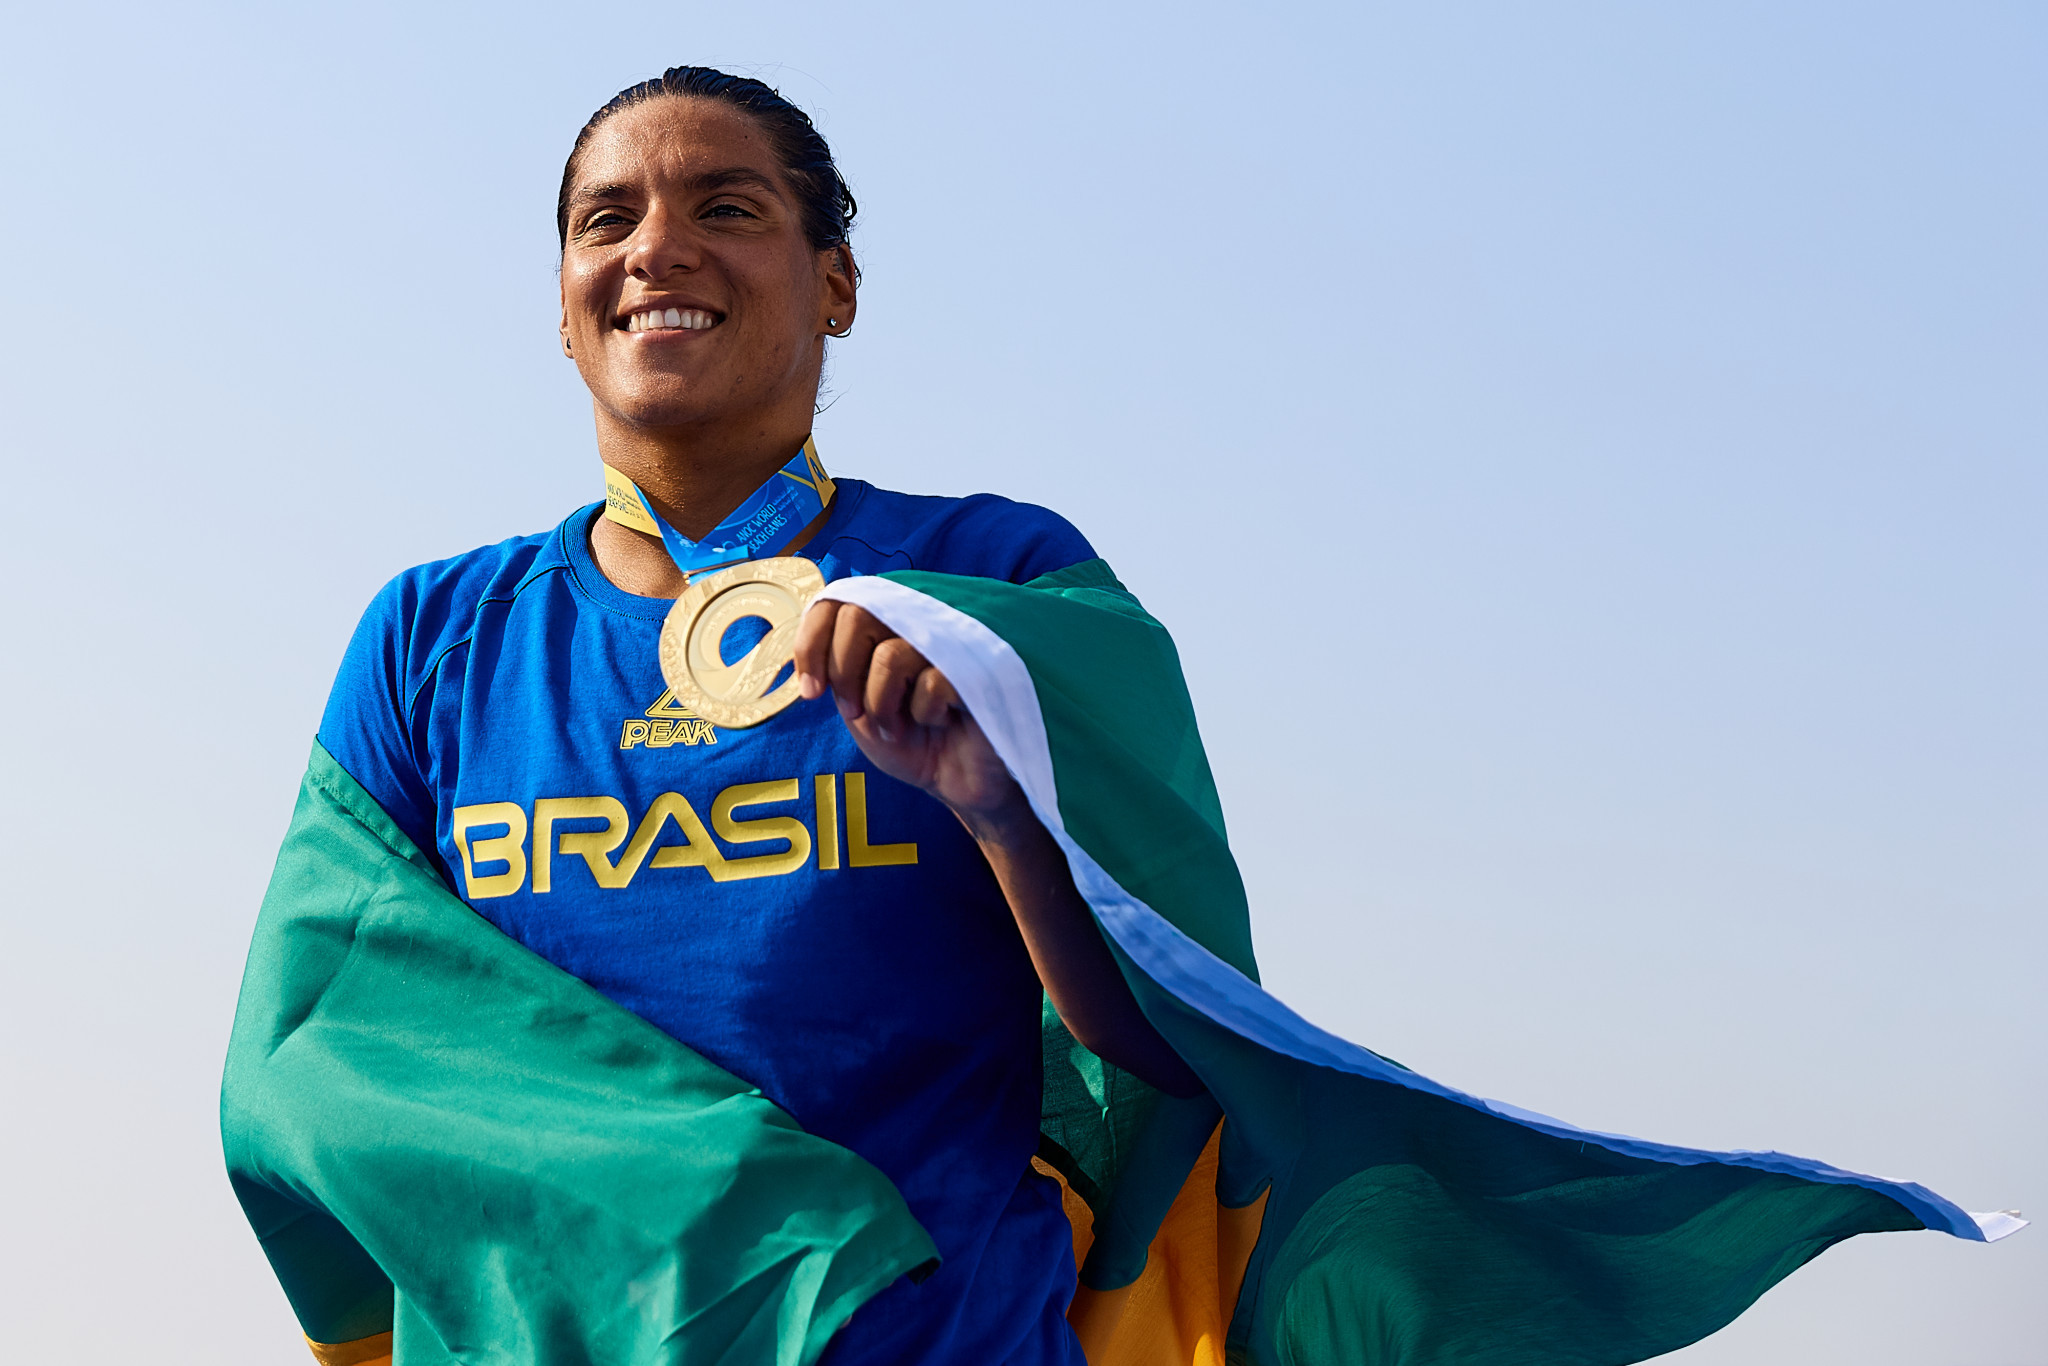 Ana De Jesus Soares of Brazil was the women's champion ©ANOC